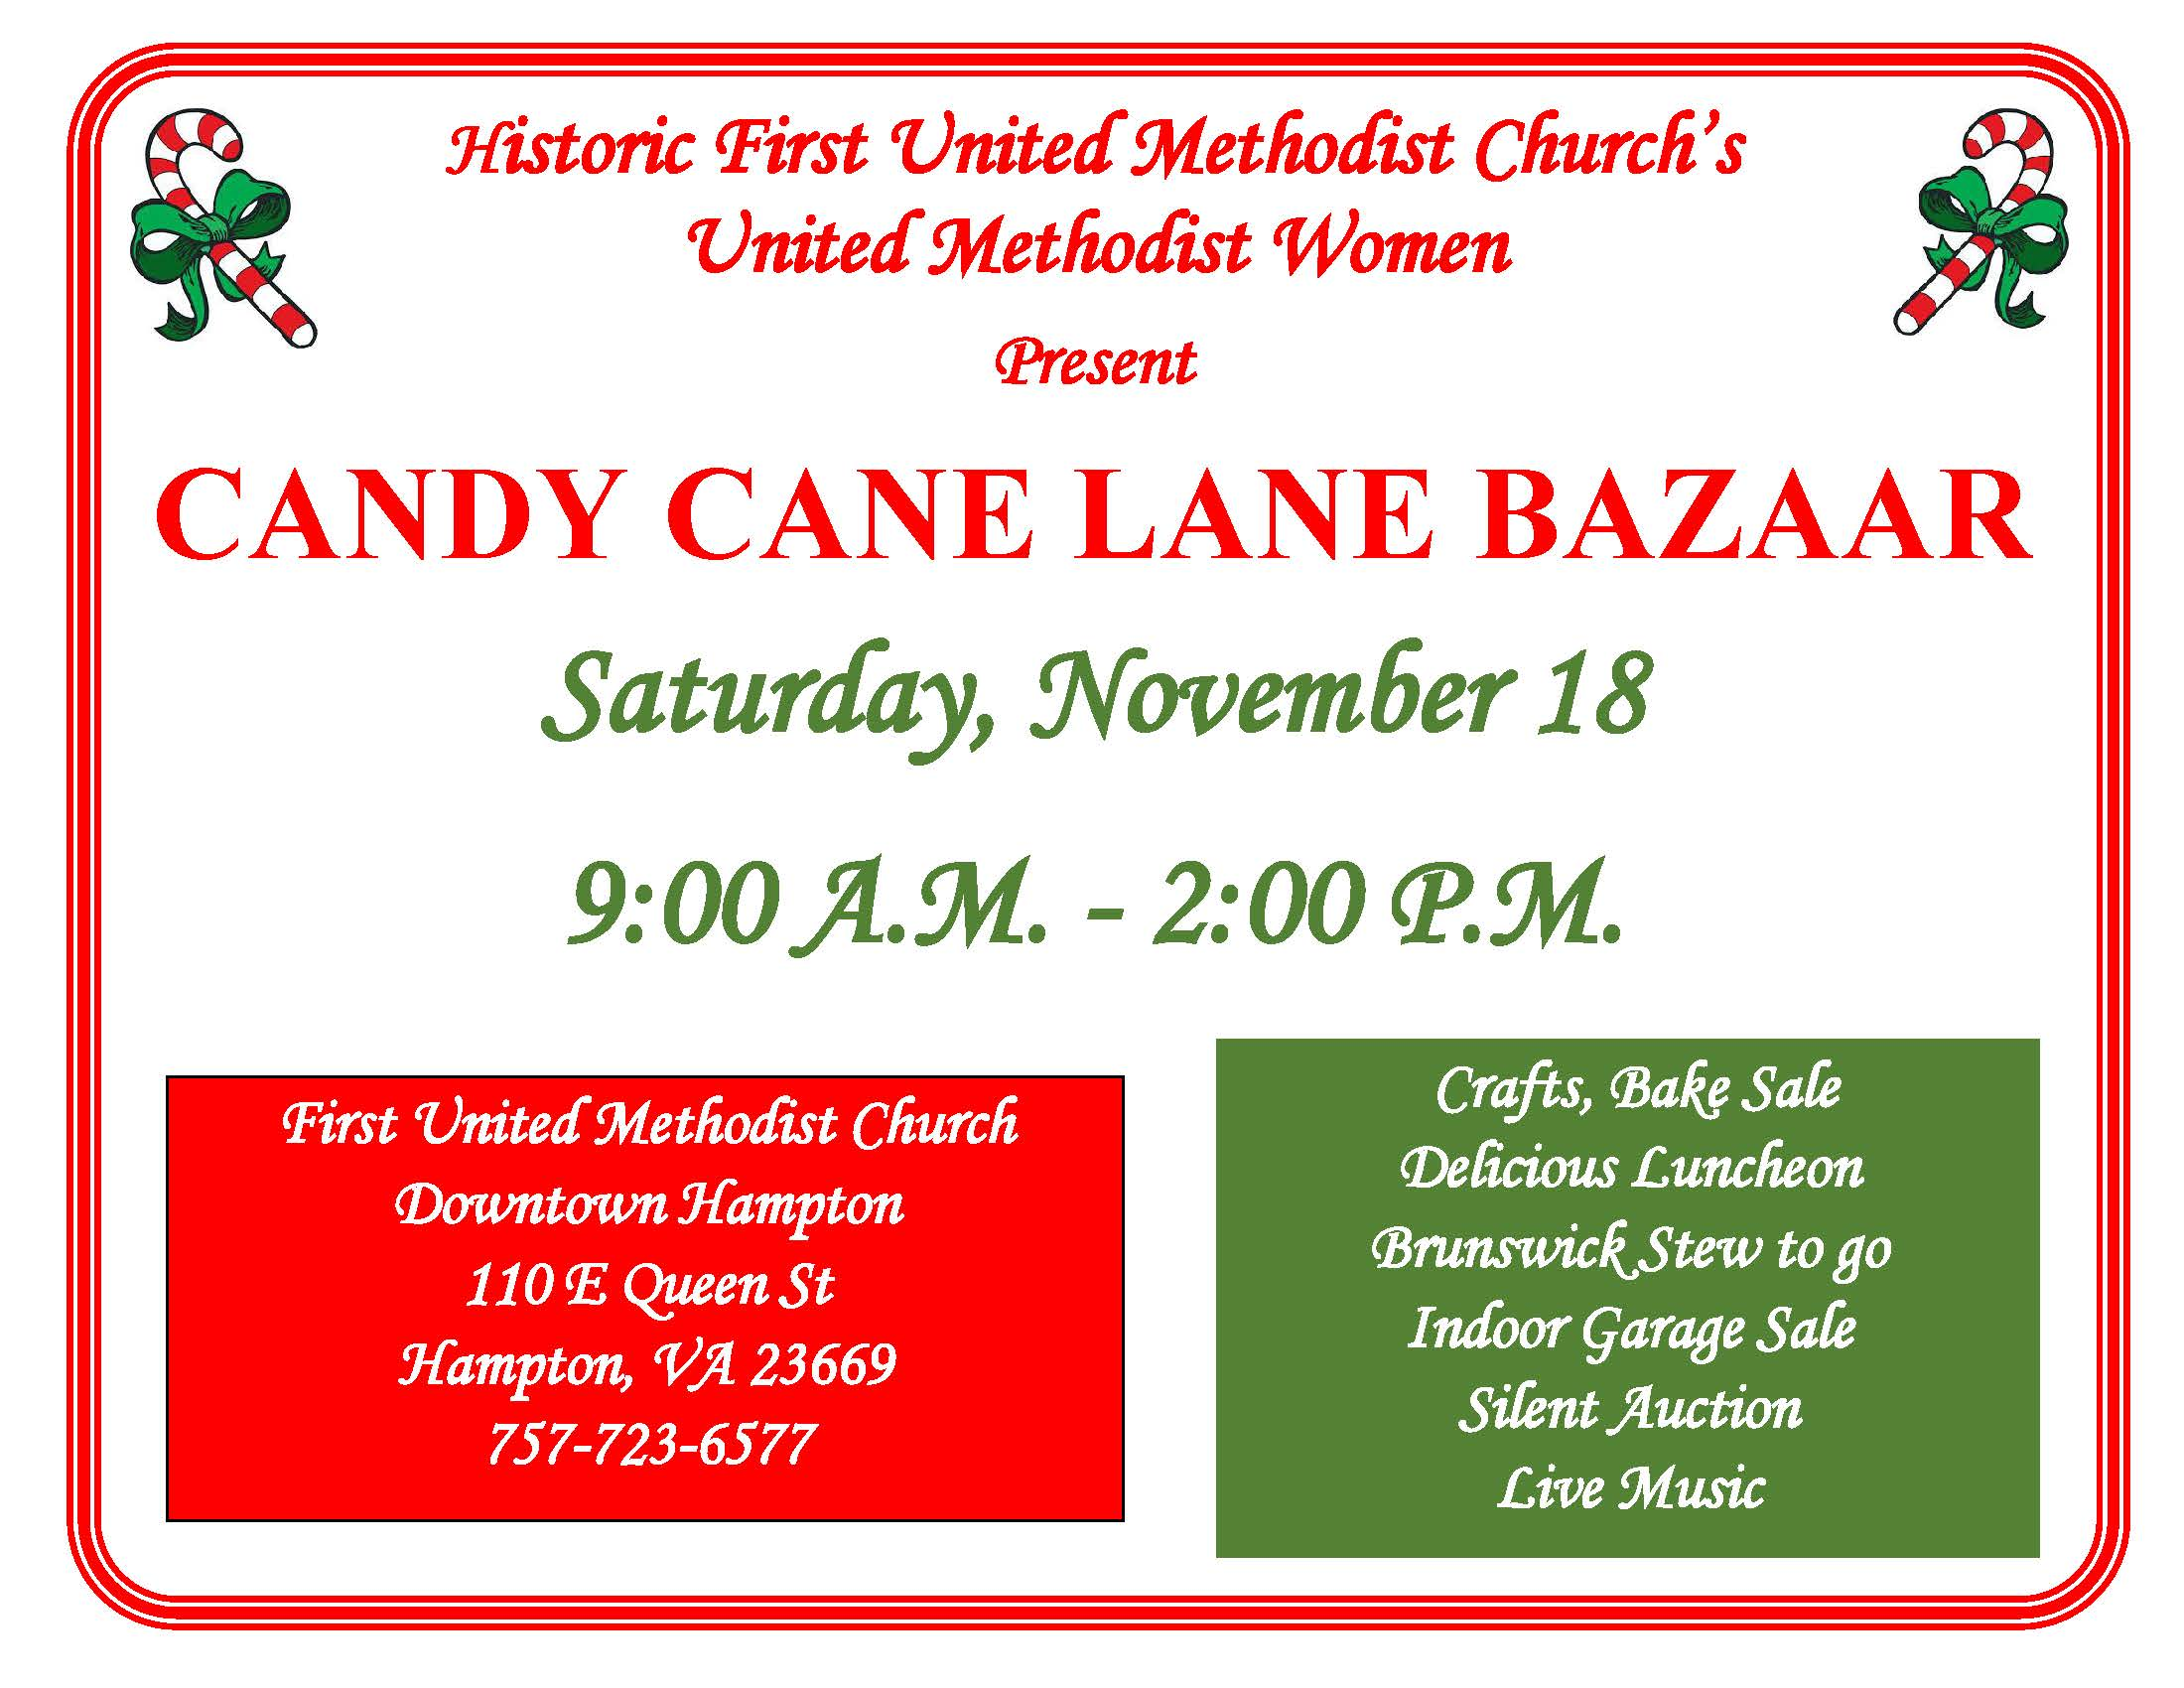 Candy-Cane-Lane-Bazaar-Flyer.jpg